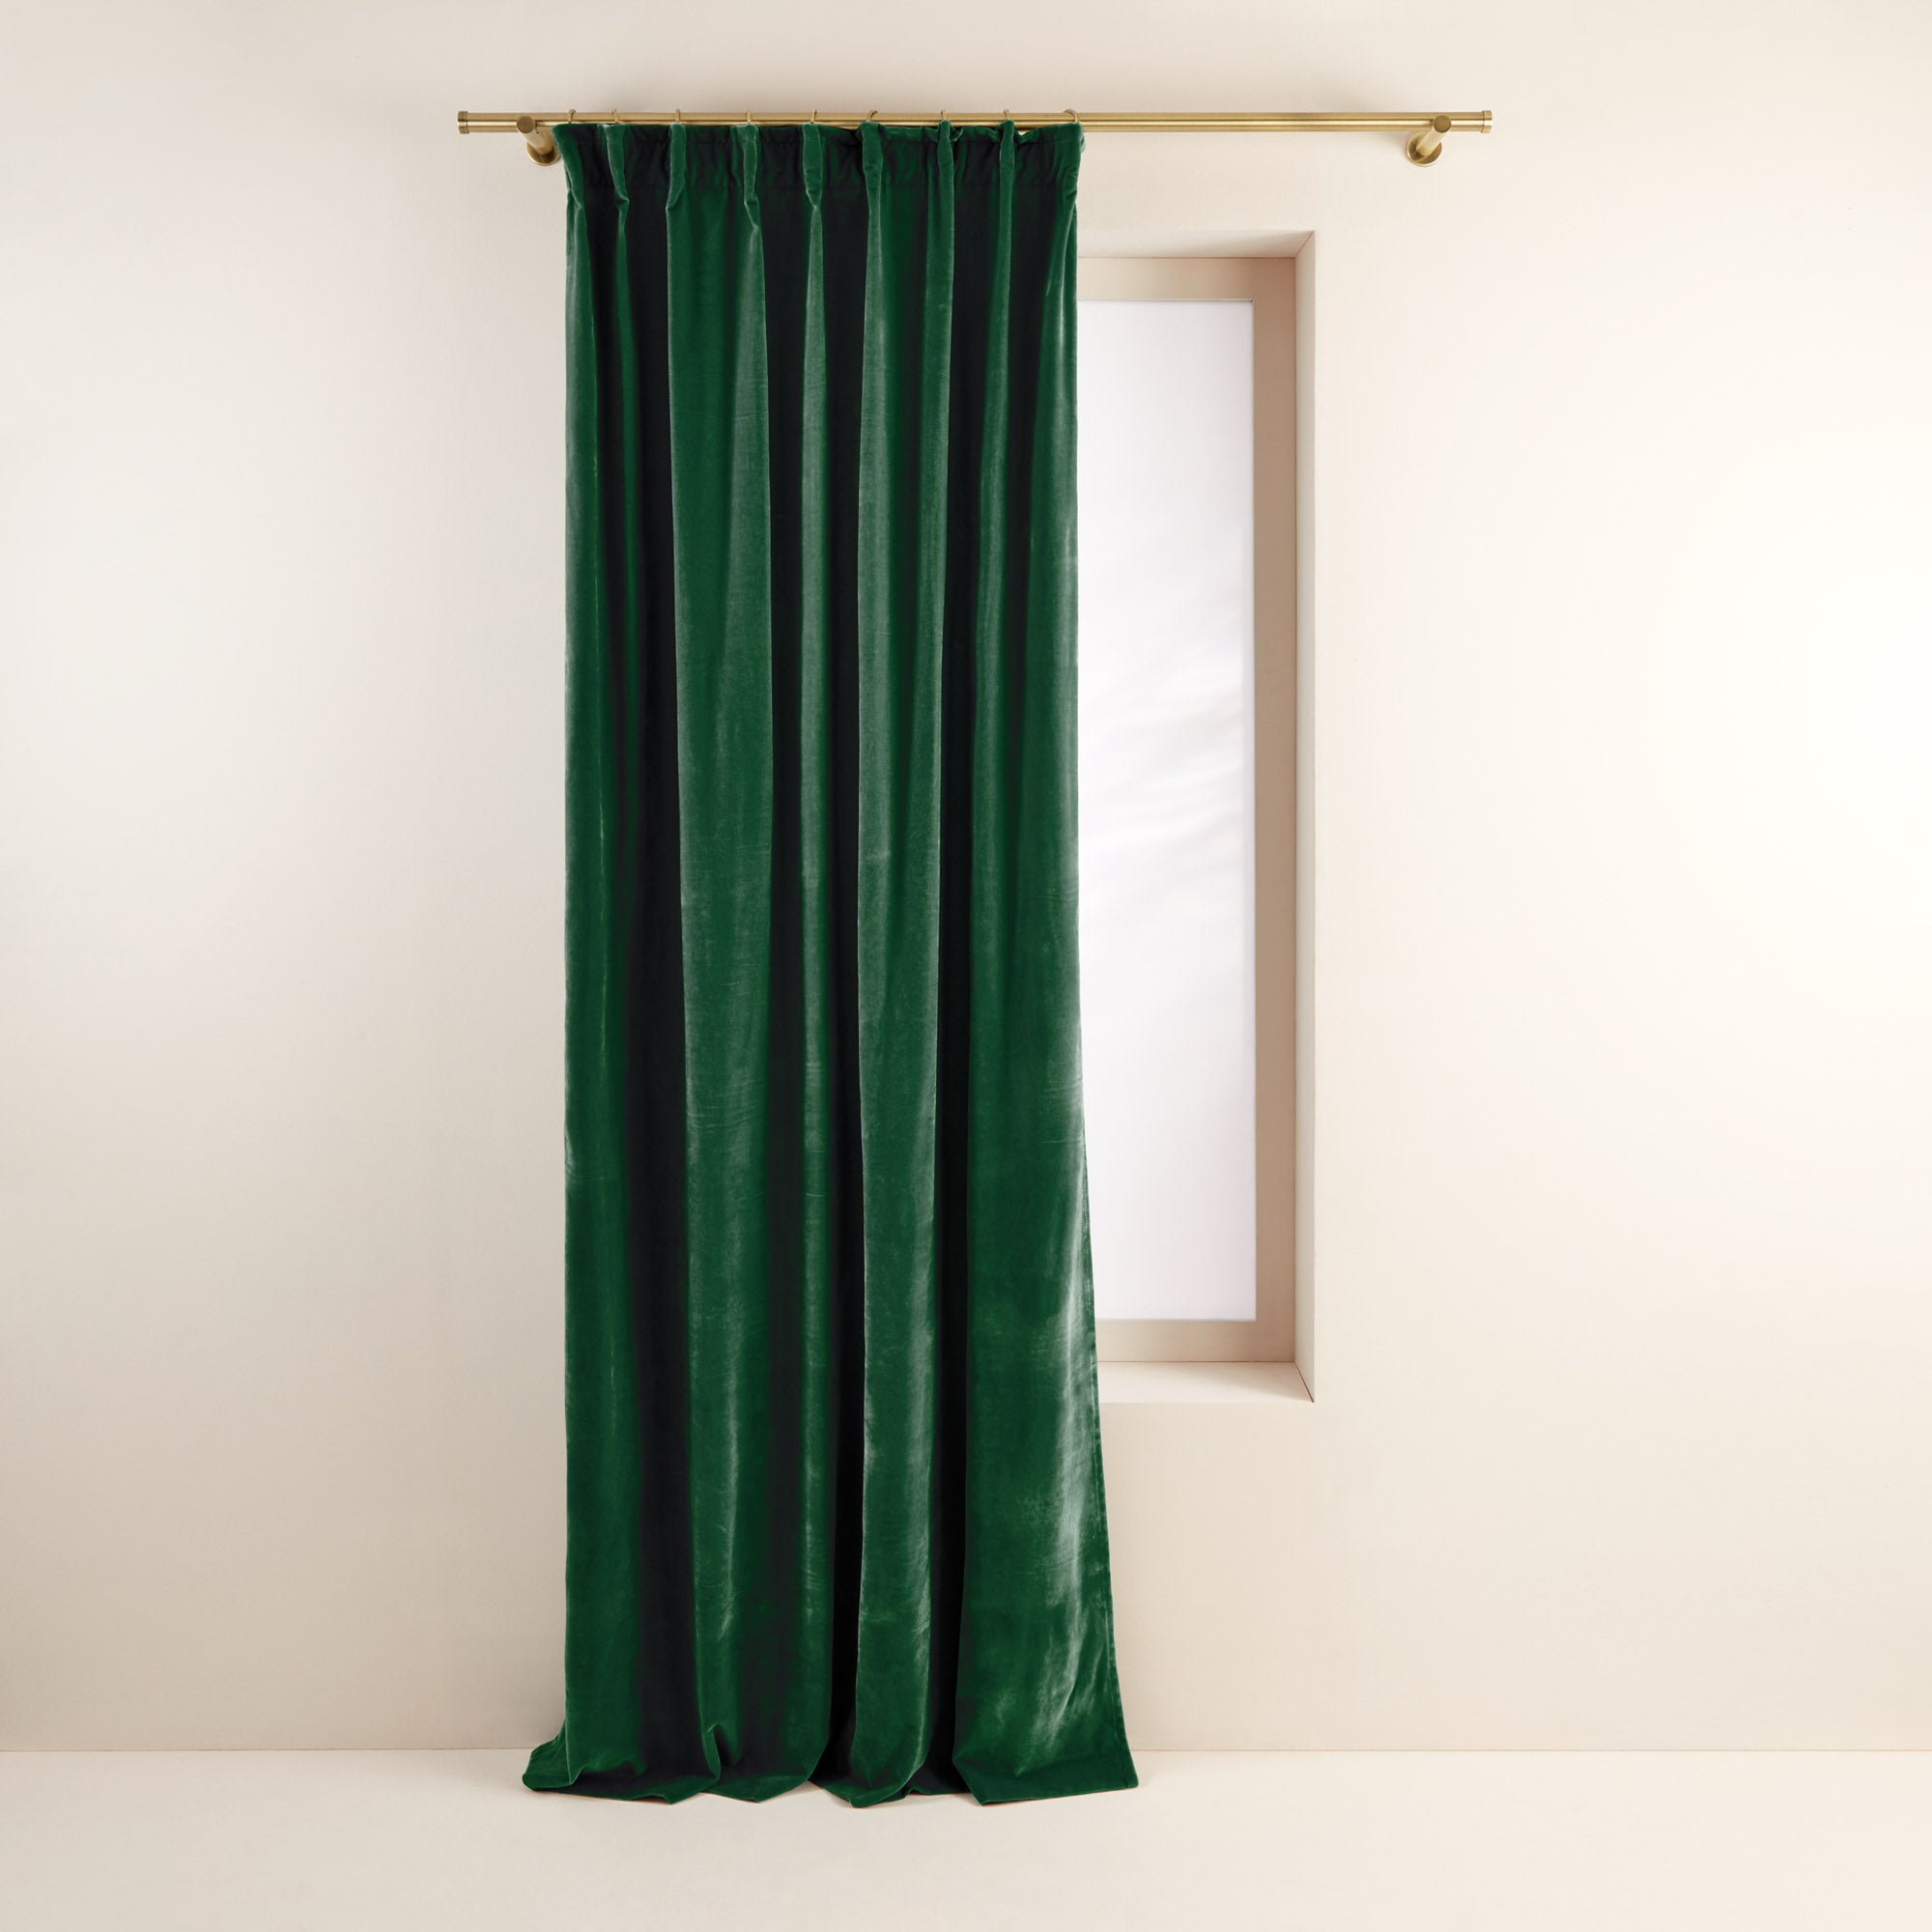 Rideau à ruban fronceur DARIO 134x280 cm Vert moyen